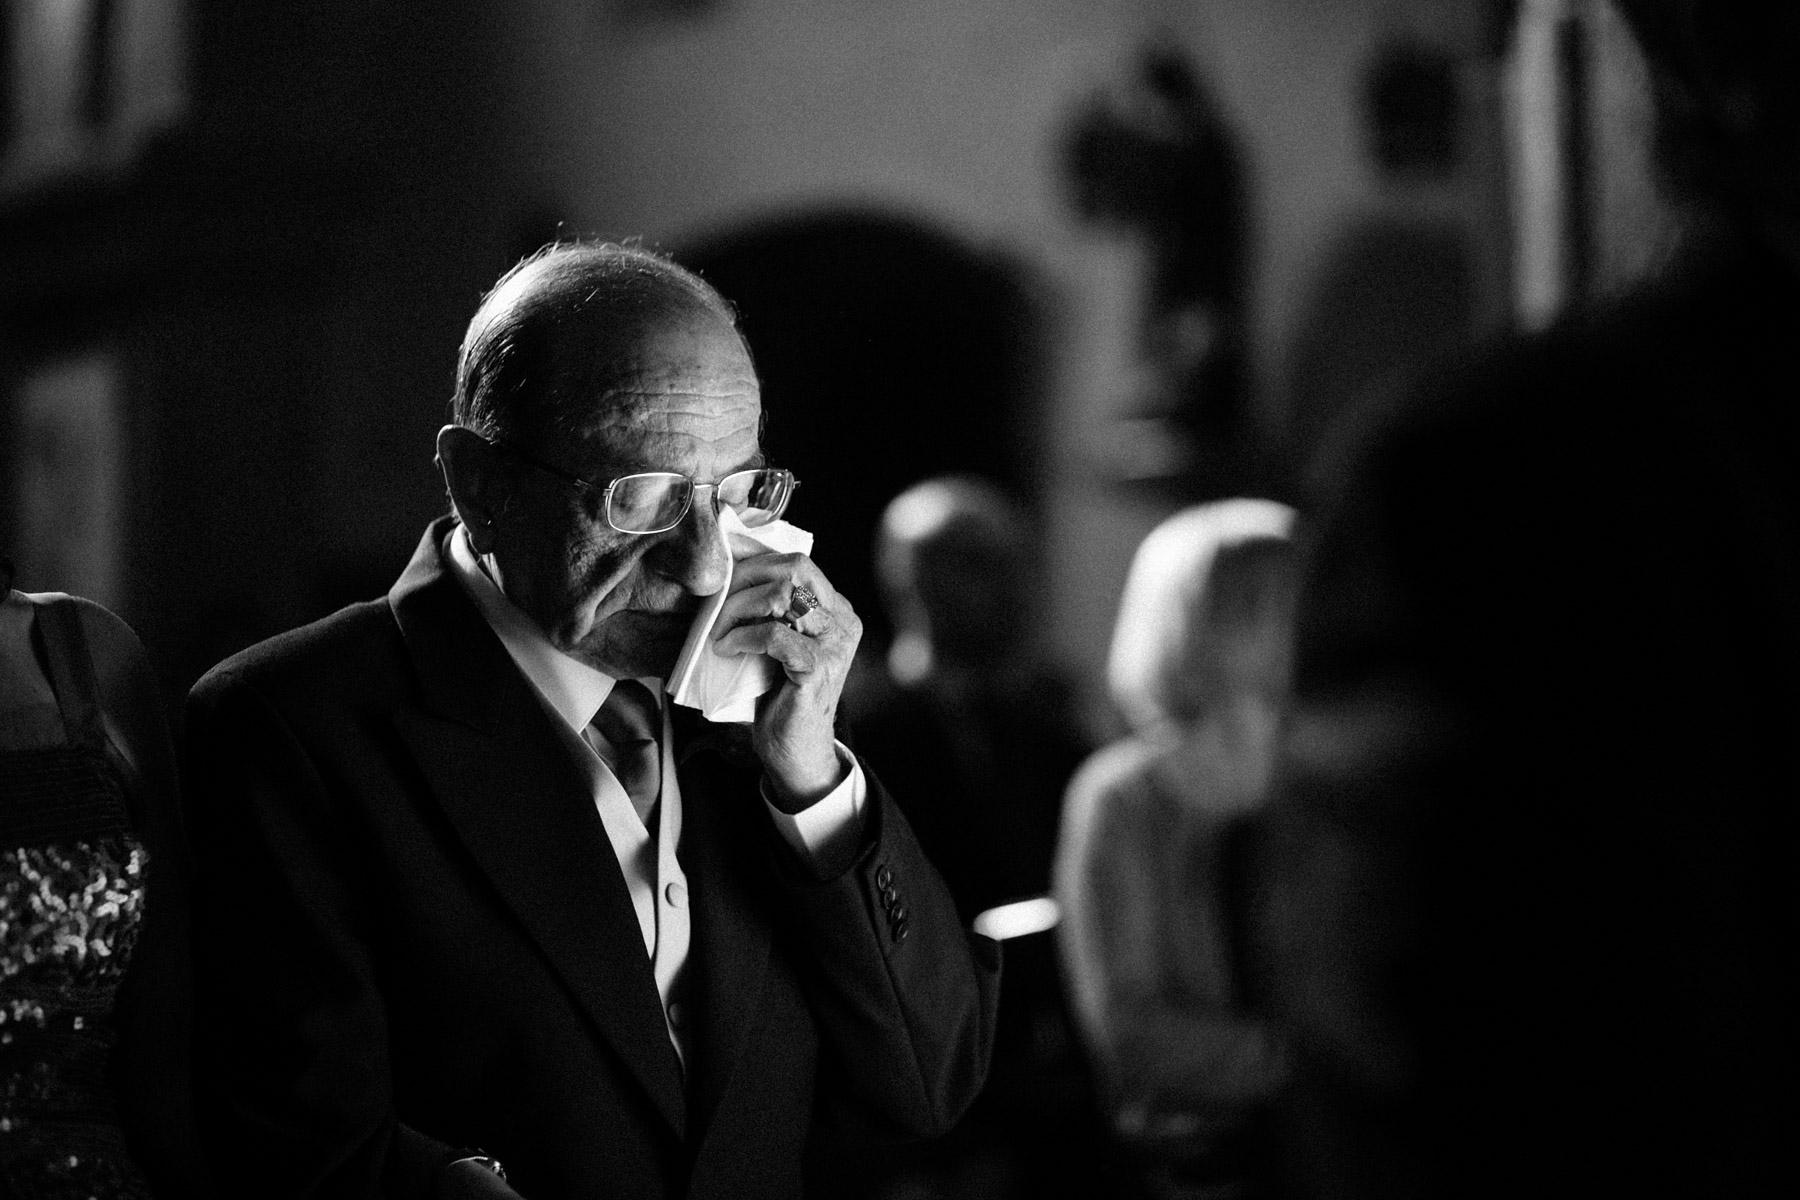 fotografo de bodas Jairo Crena-35